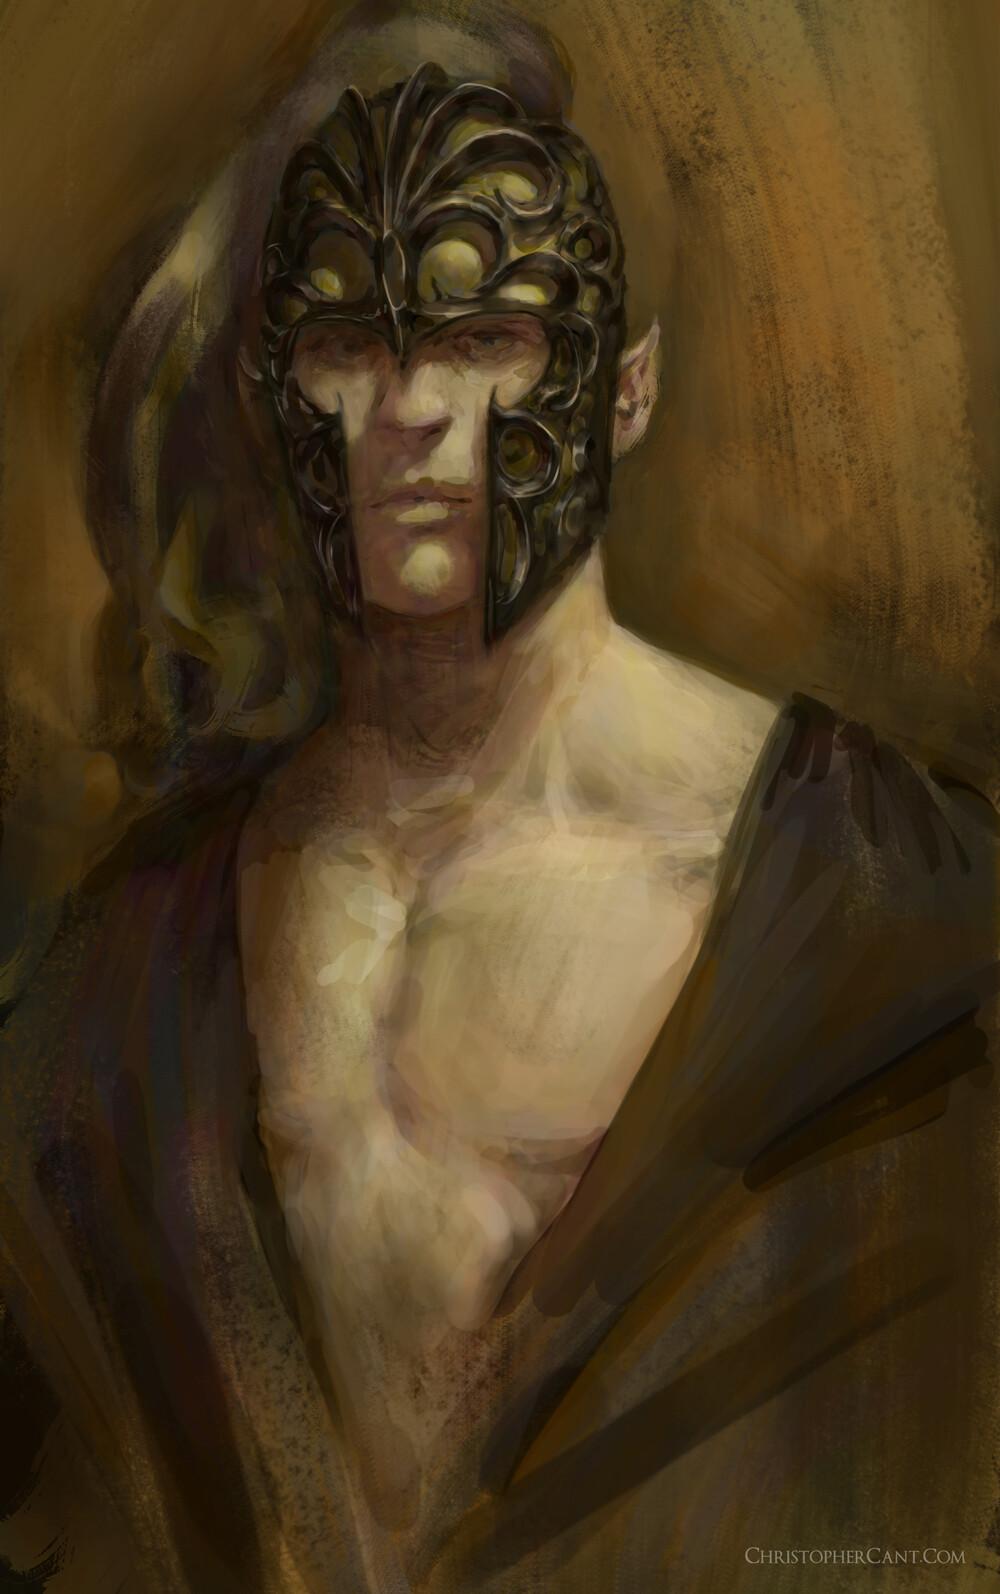 Khedun the Cursed Prince